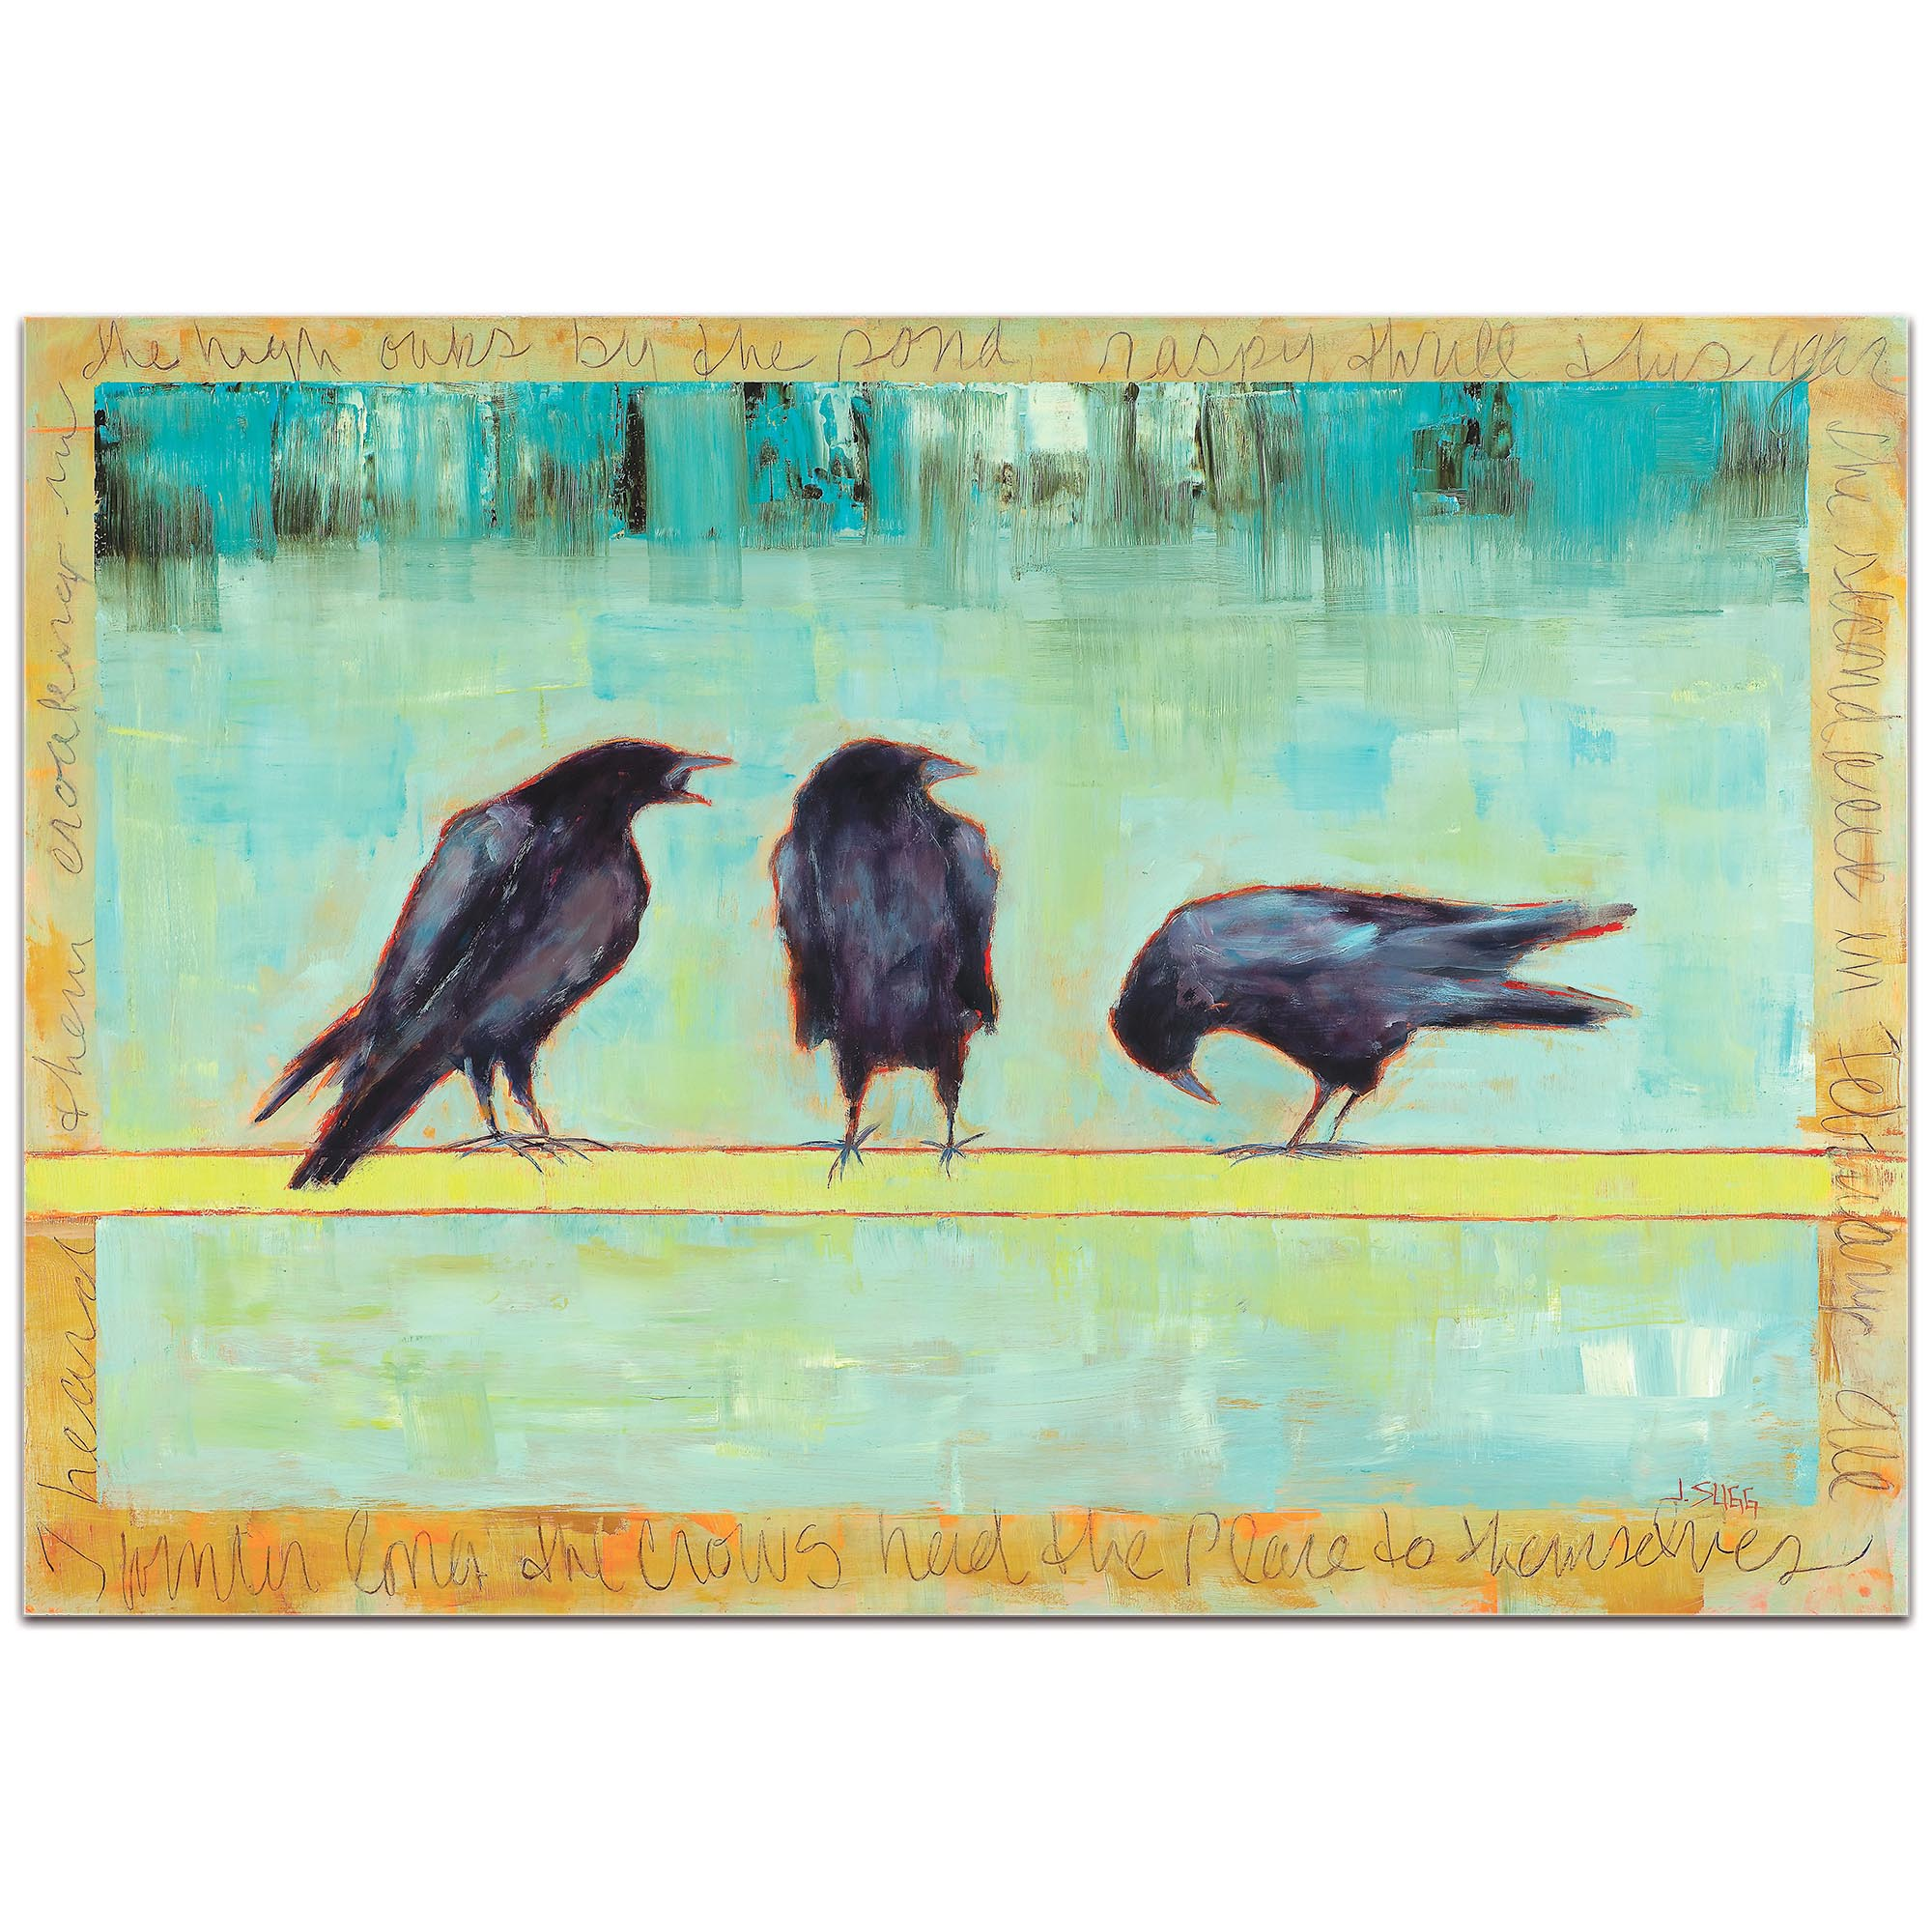 Contemporary Wall Art 'Crow Bar 1' - Urban Birds Decor on Metal or Plexiglass - Image 2